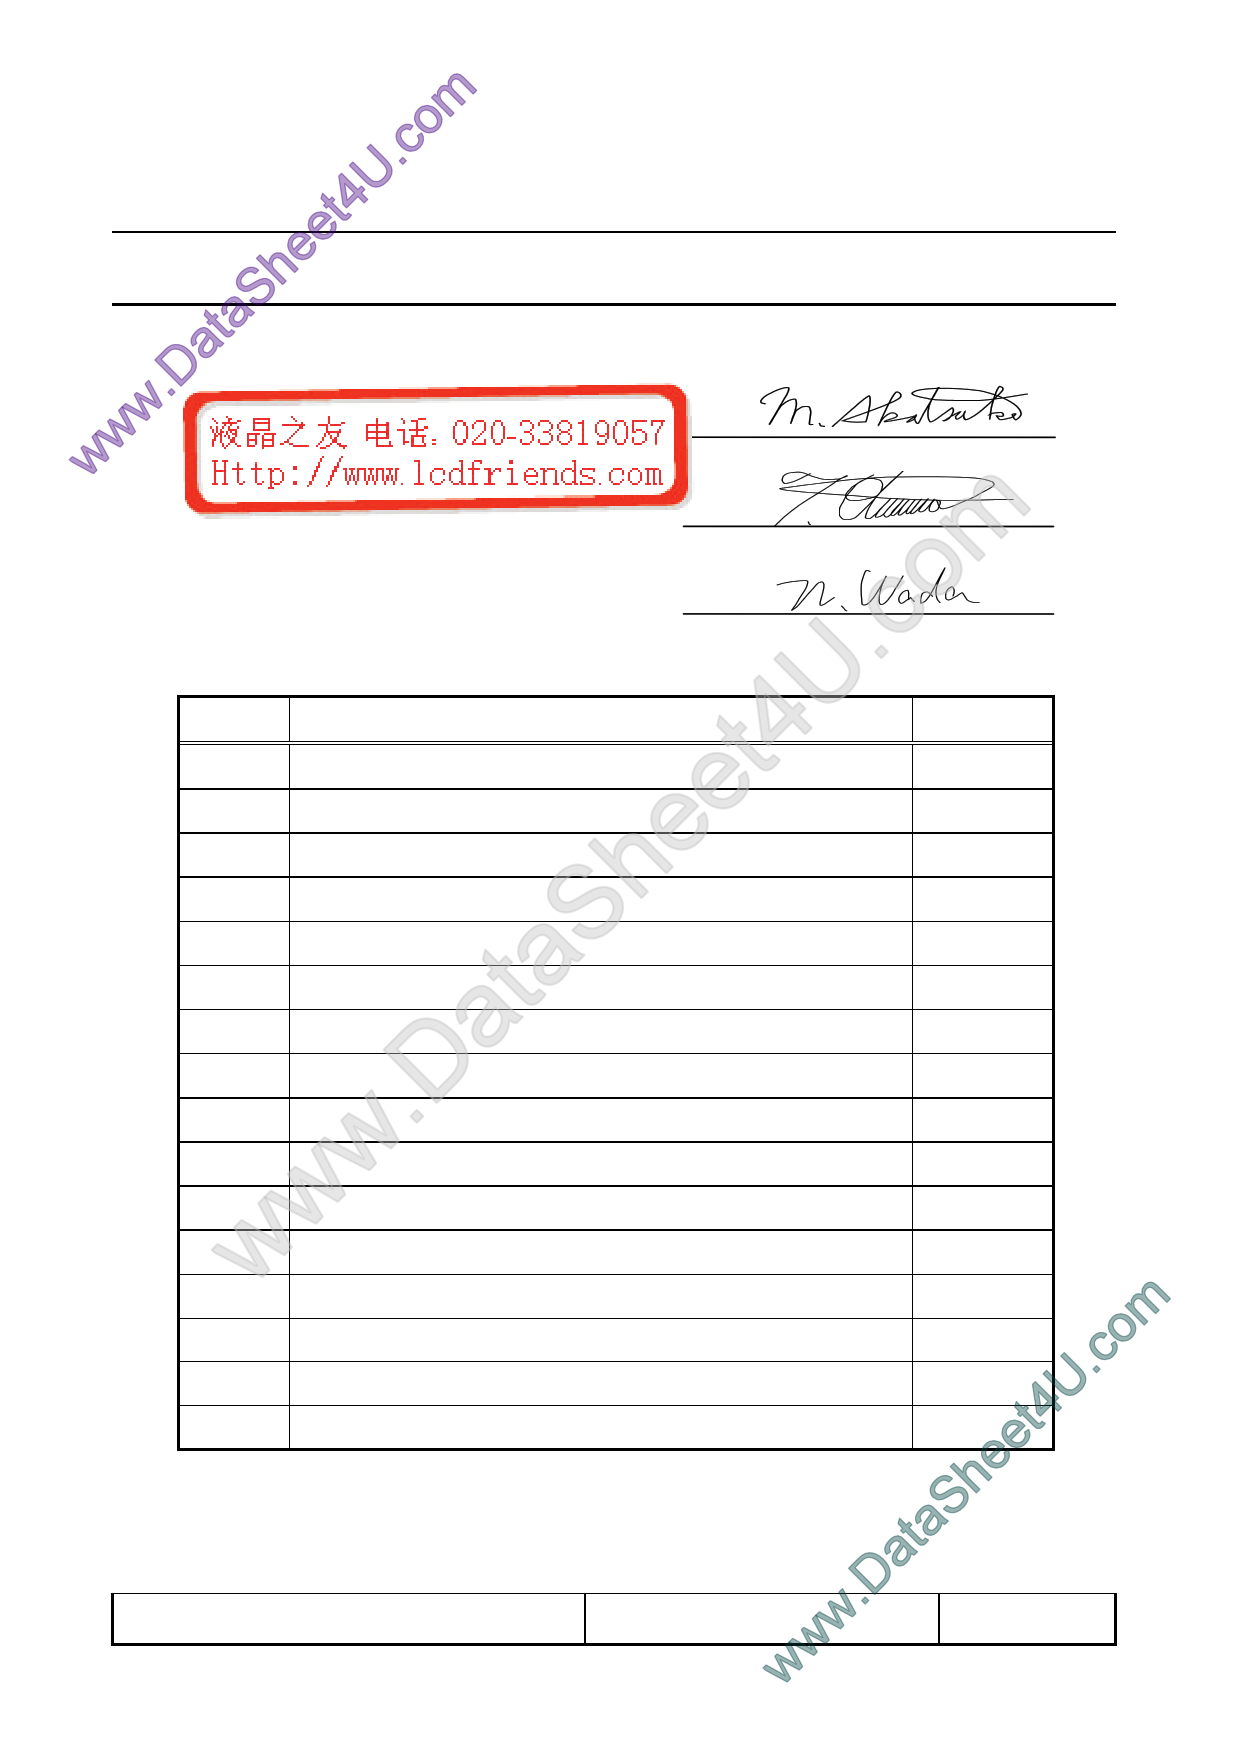 T-51512D121J-FW-A-AE دیتاشیت PDF